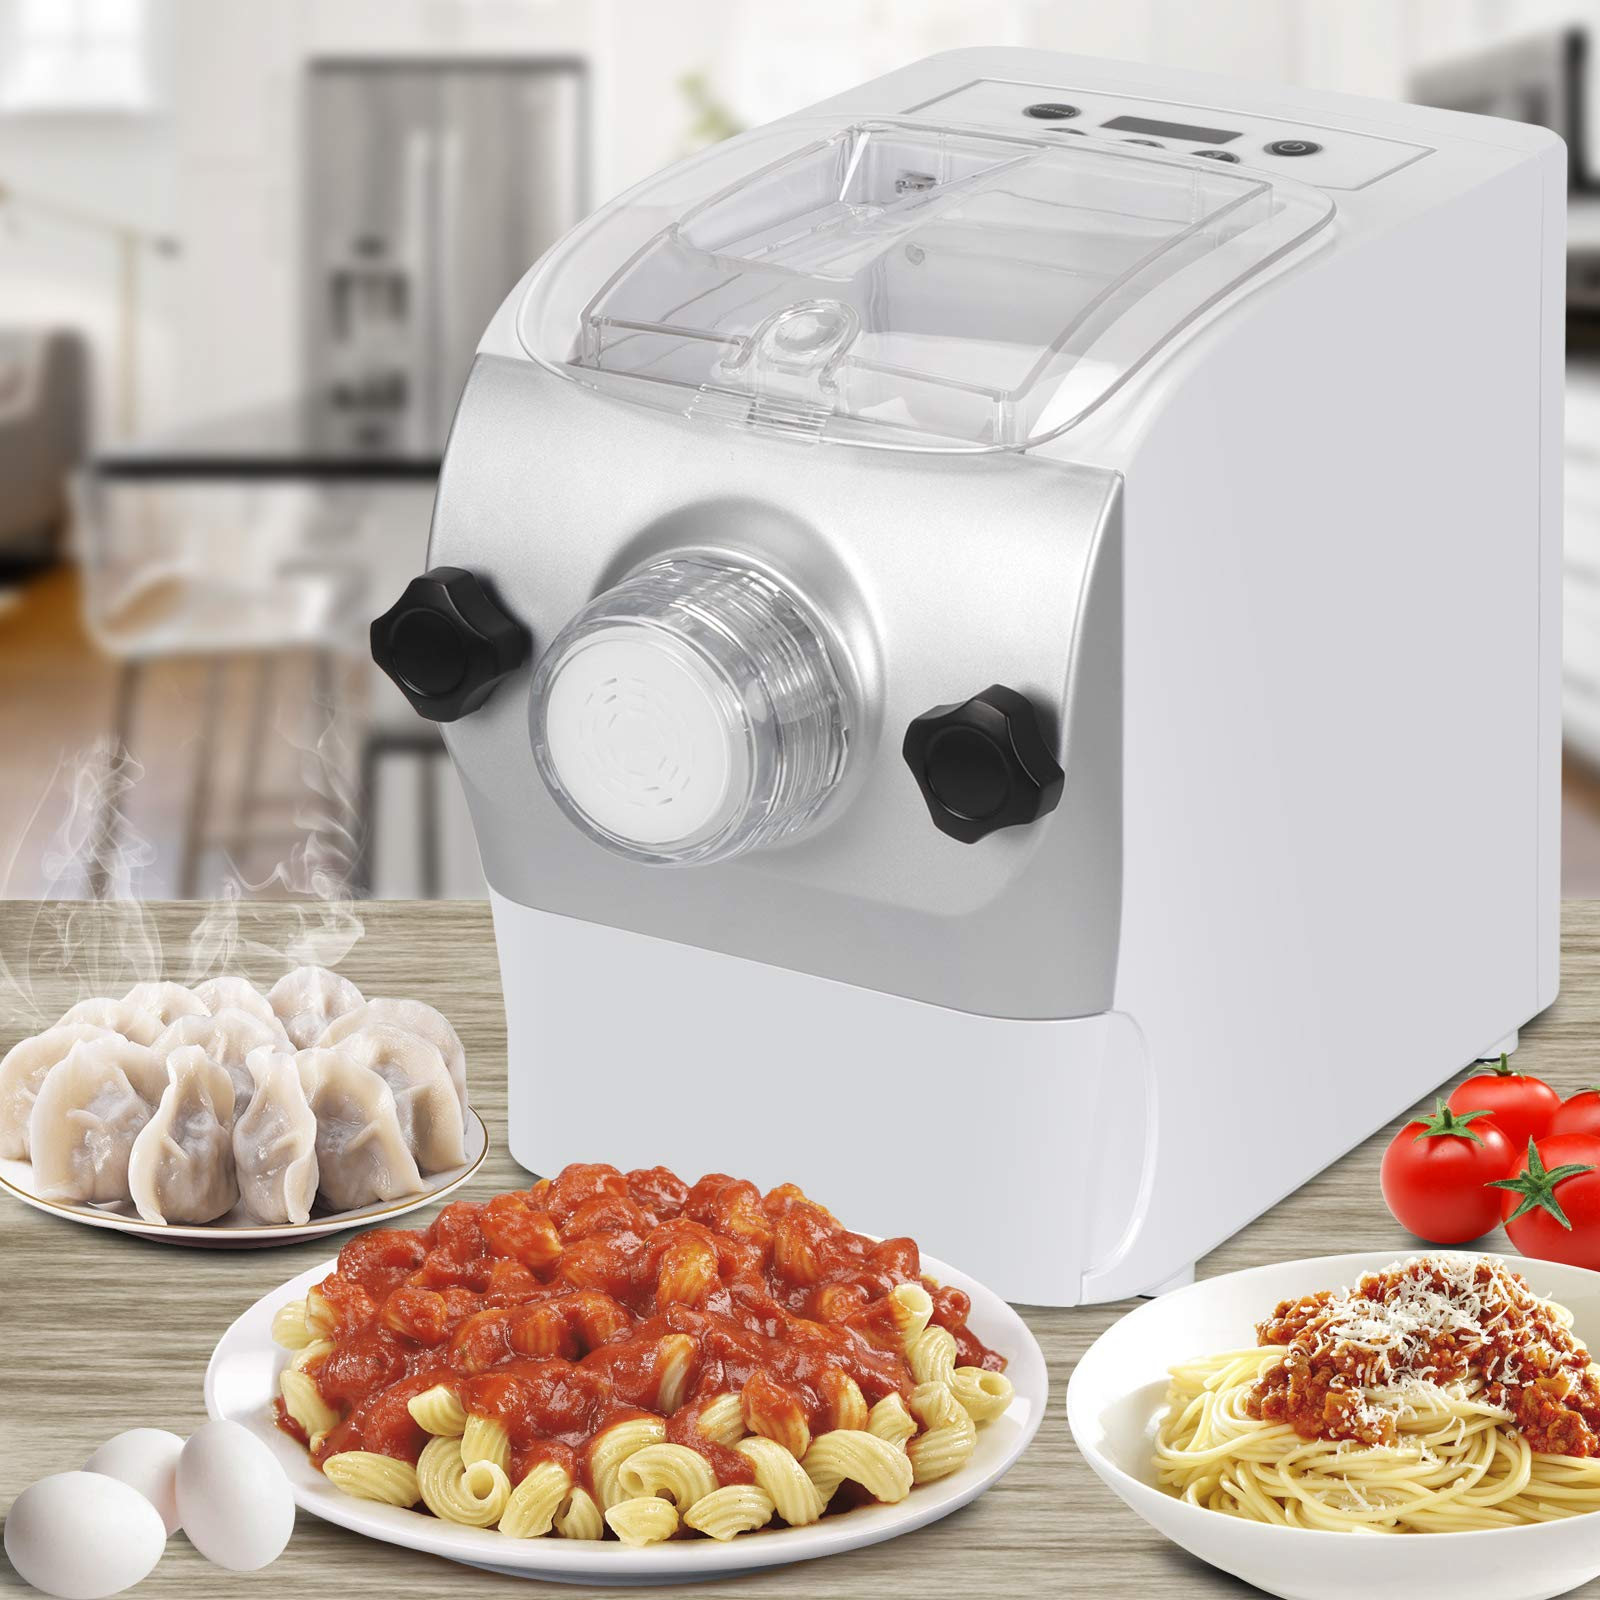 ZENSTYLE Electric Pasta Maker Automatic Noodle Maker Spaghetti Lasagna Fettuccine Macaroni Bonus Ravioli Sausage Machine with Mixes, Extrudes & Kneads by ZENSTYLE